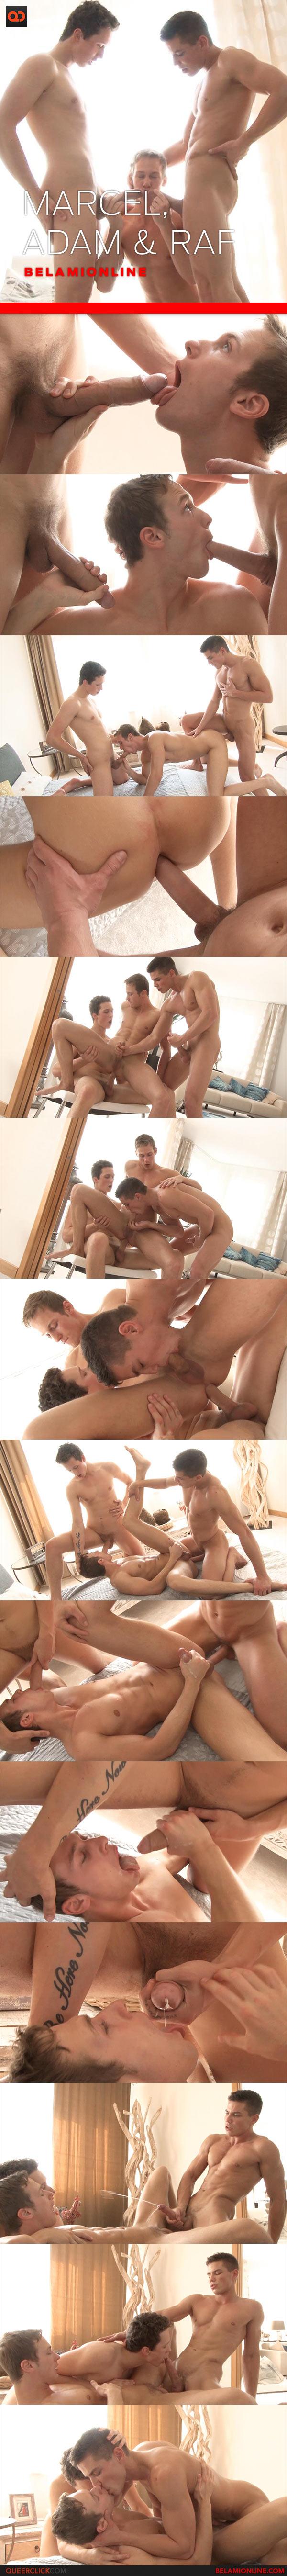 BelAmi Online: Adam Archuleta, Raf Koons and Marcel Gassion - Bareback Threesome